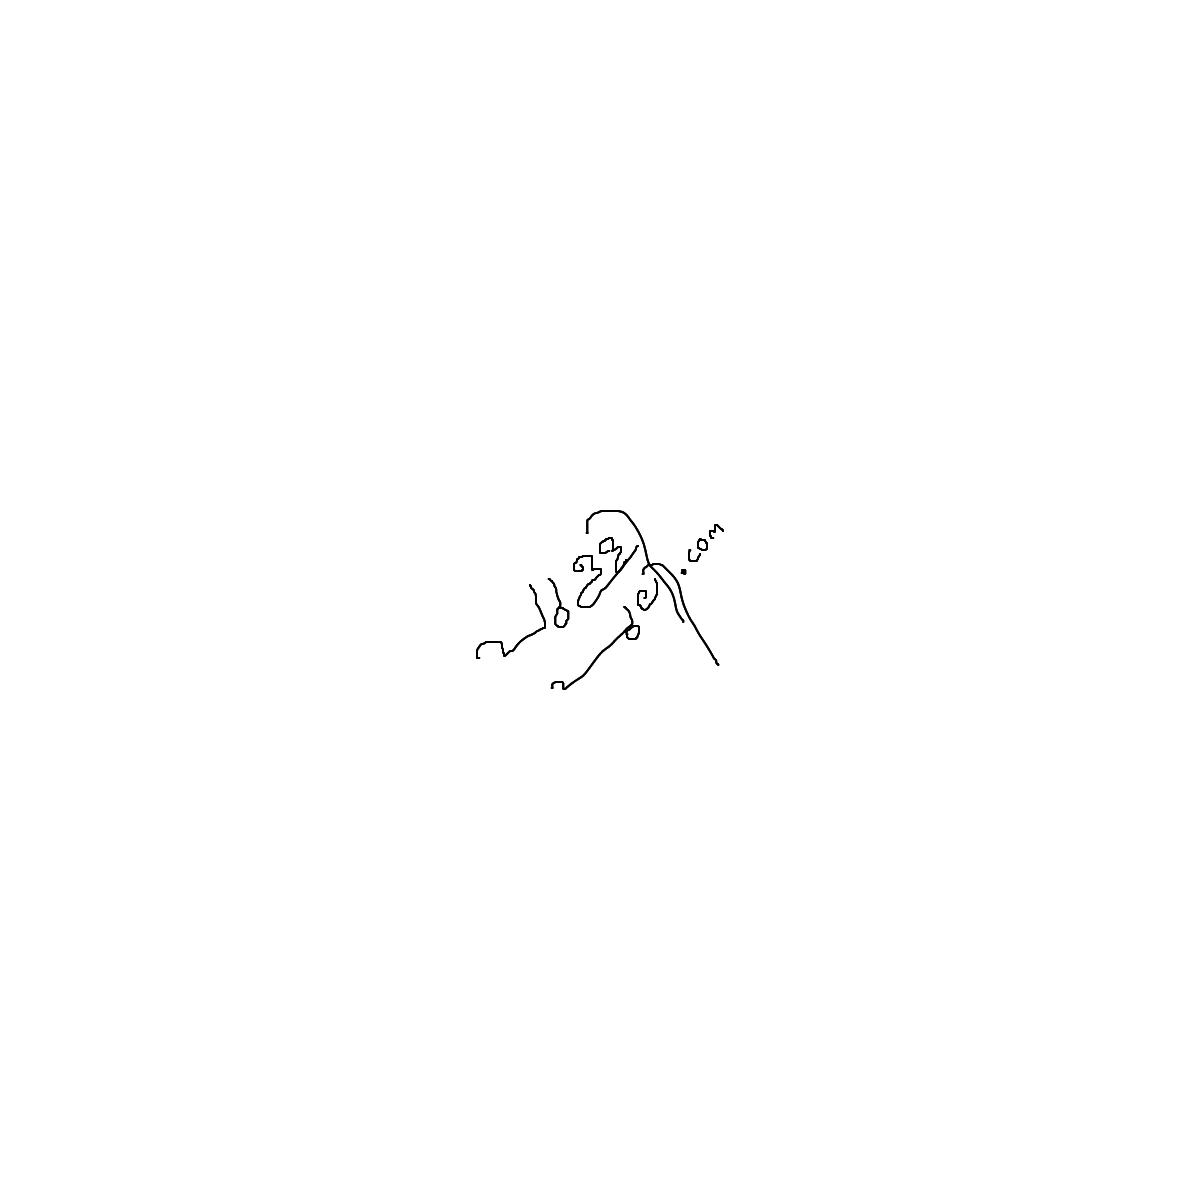 BAAAM drawing#4706 lat:10.1168193817138670lng: 76.4192123413086000